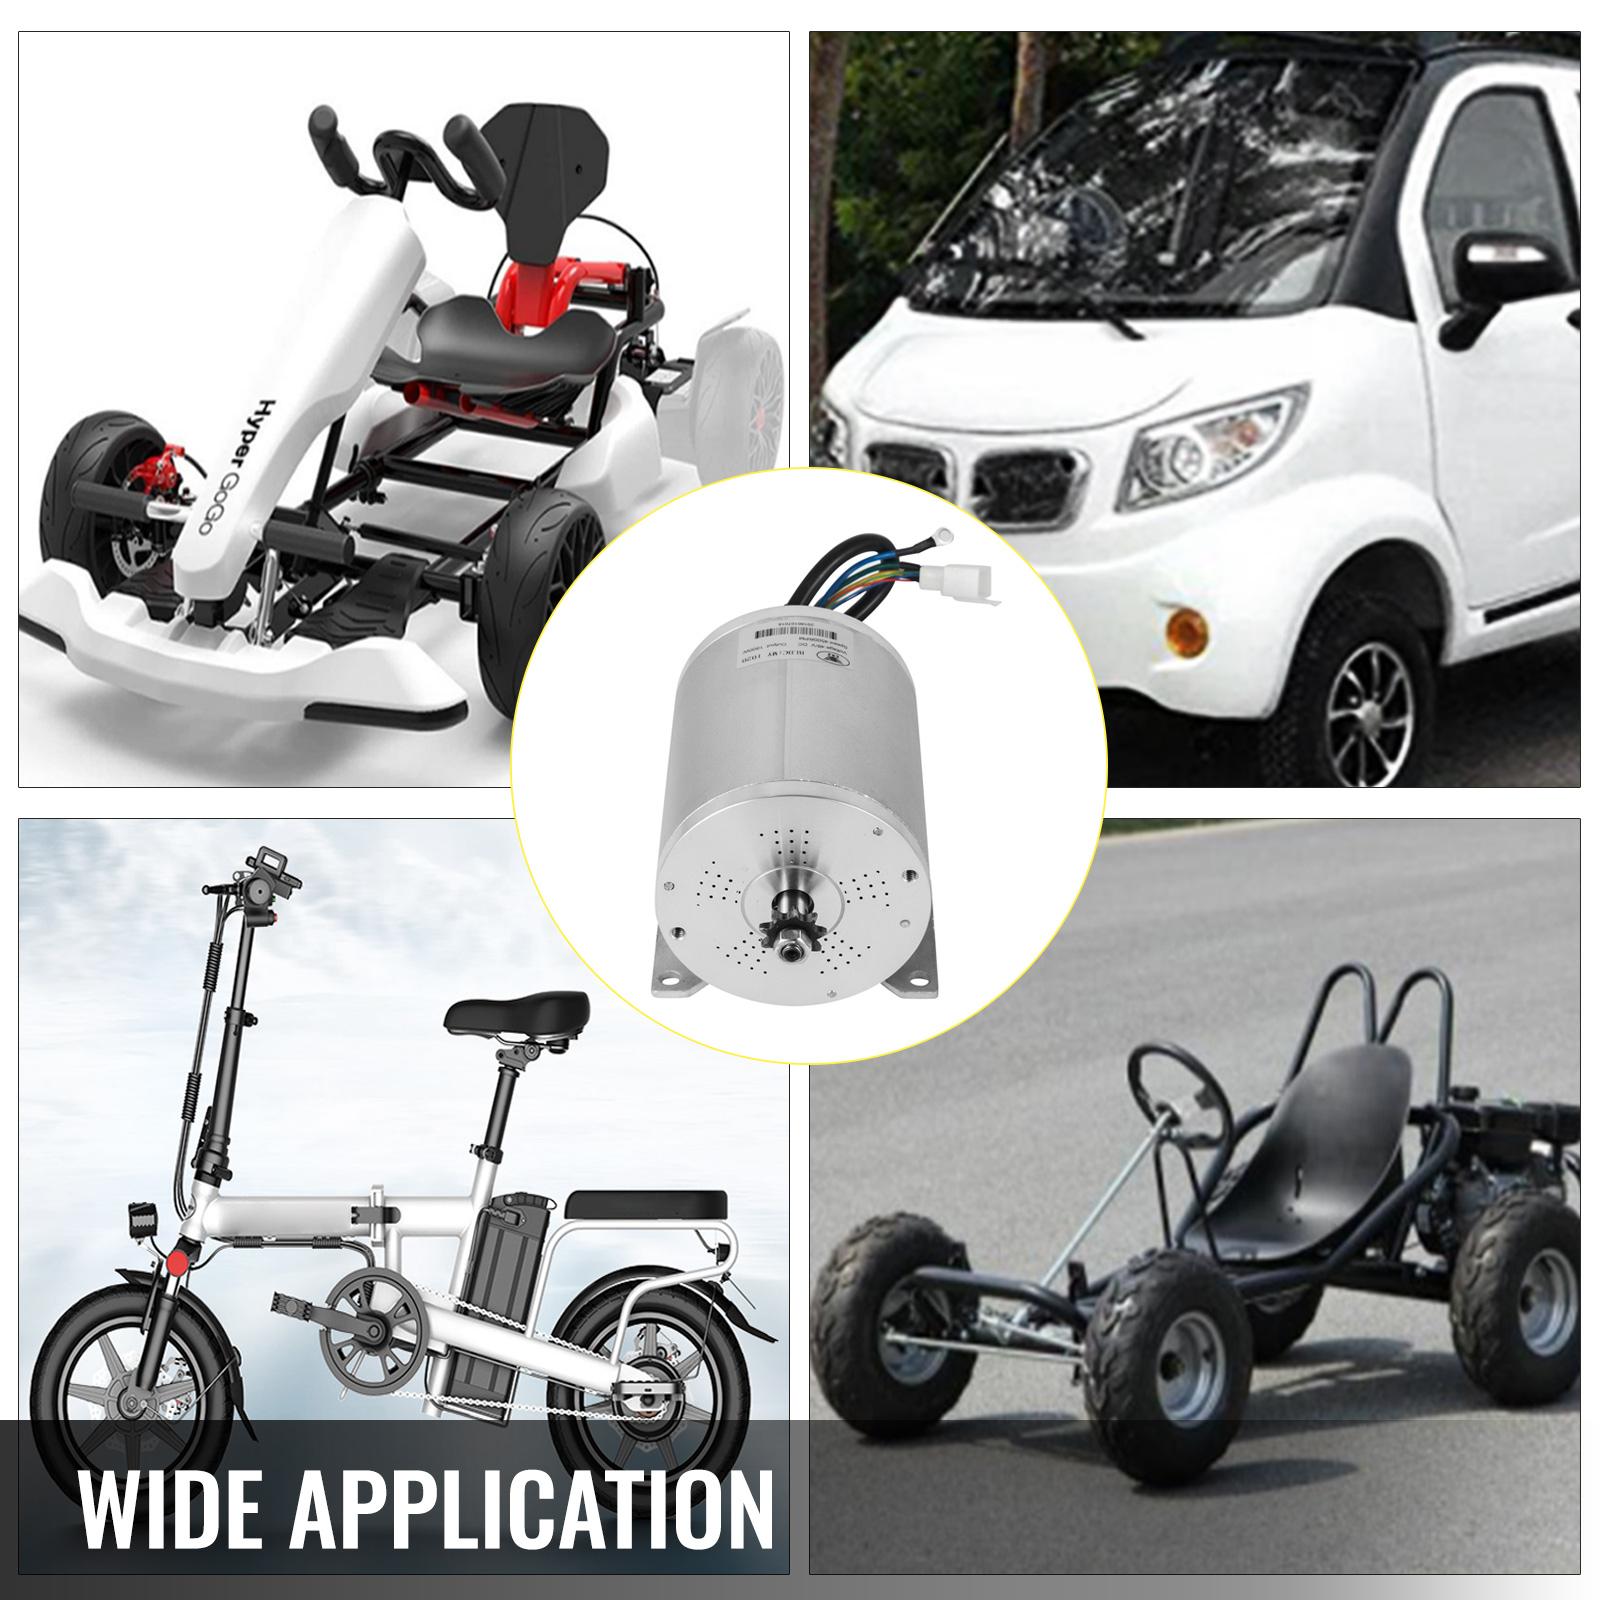 1800W-48V-DC-Brushless-Electric-Motor-Kit-f-Scooter-500-1800W-E-Bike-Go-Kart thumbnail 127